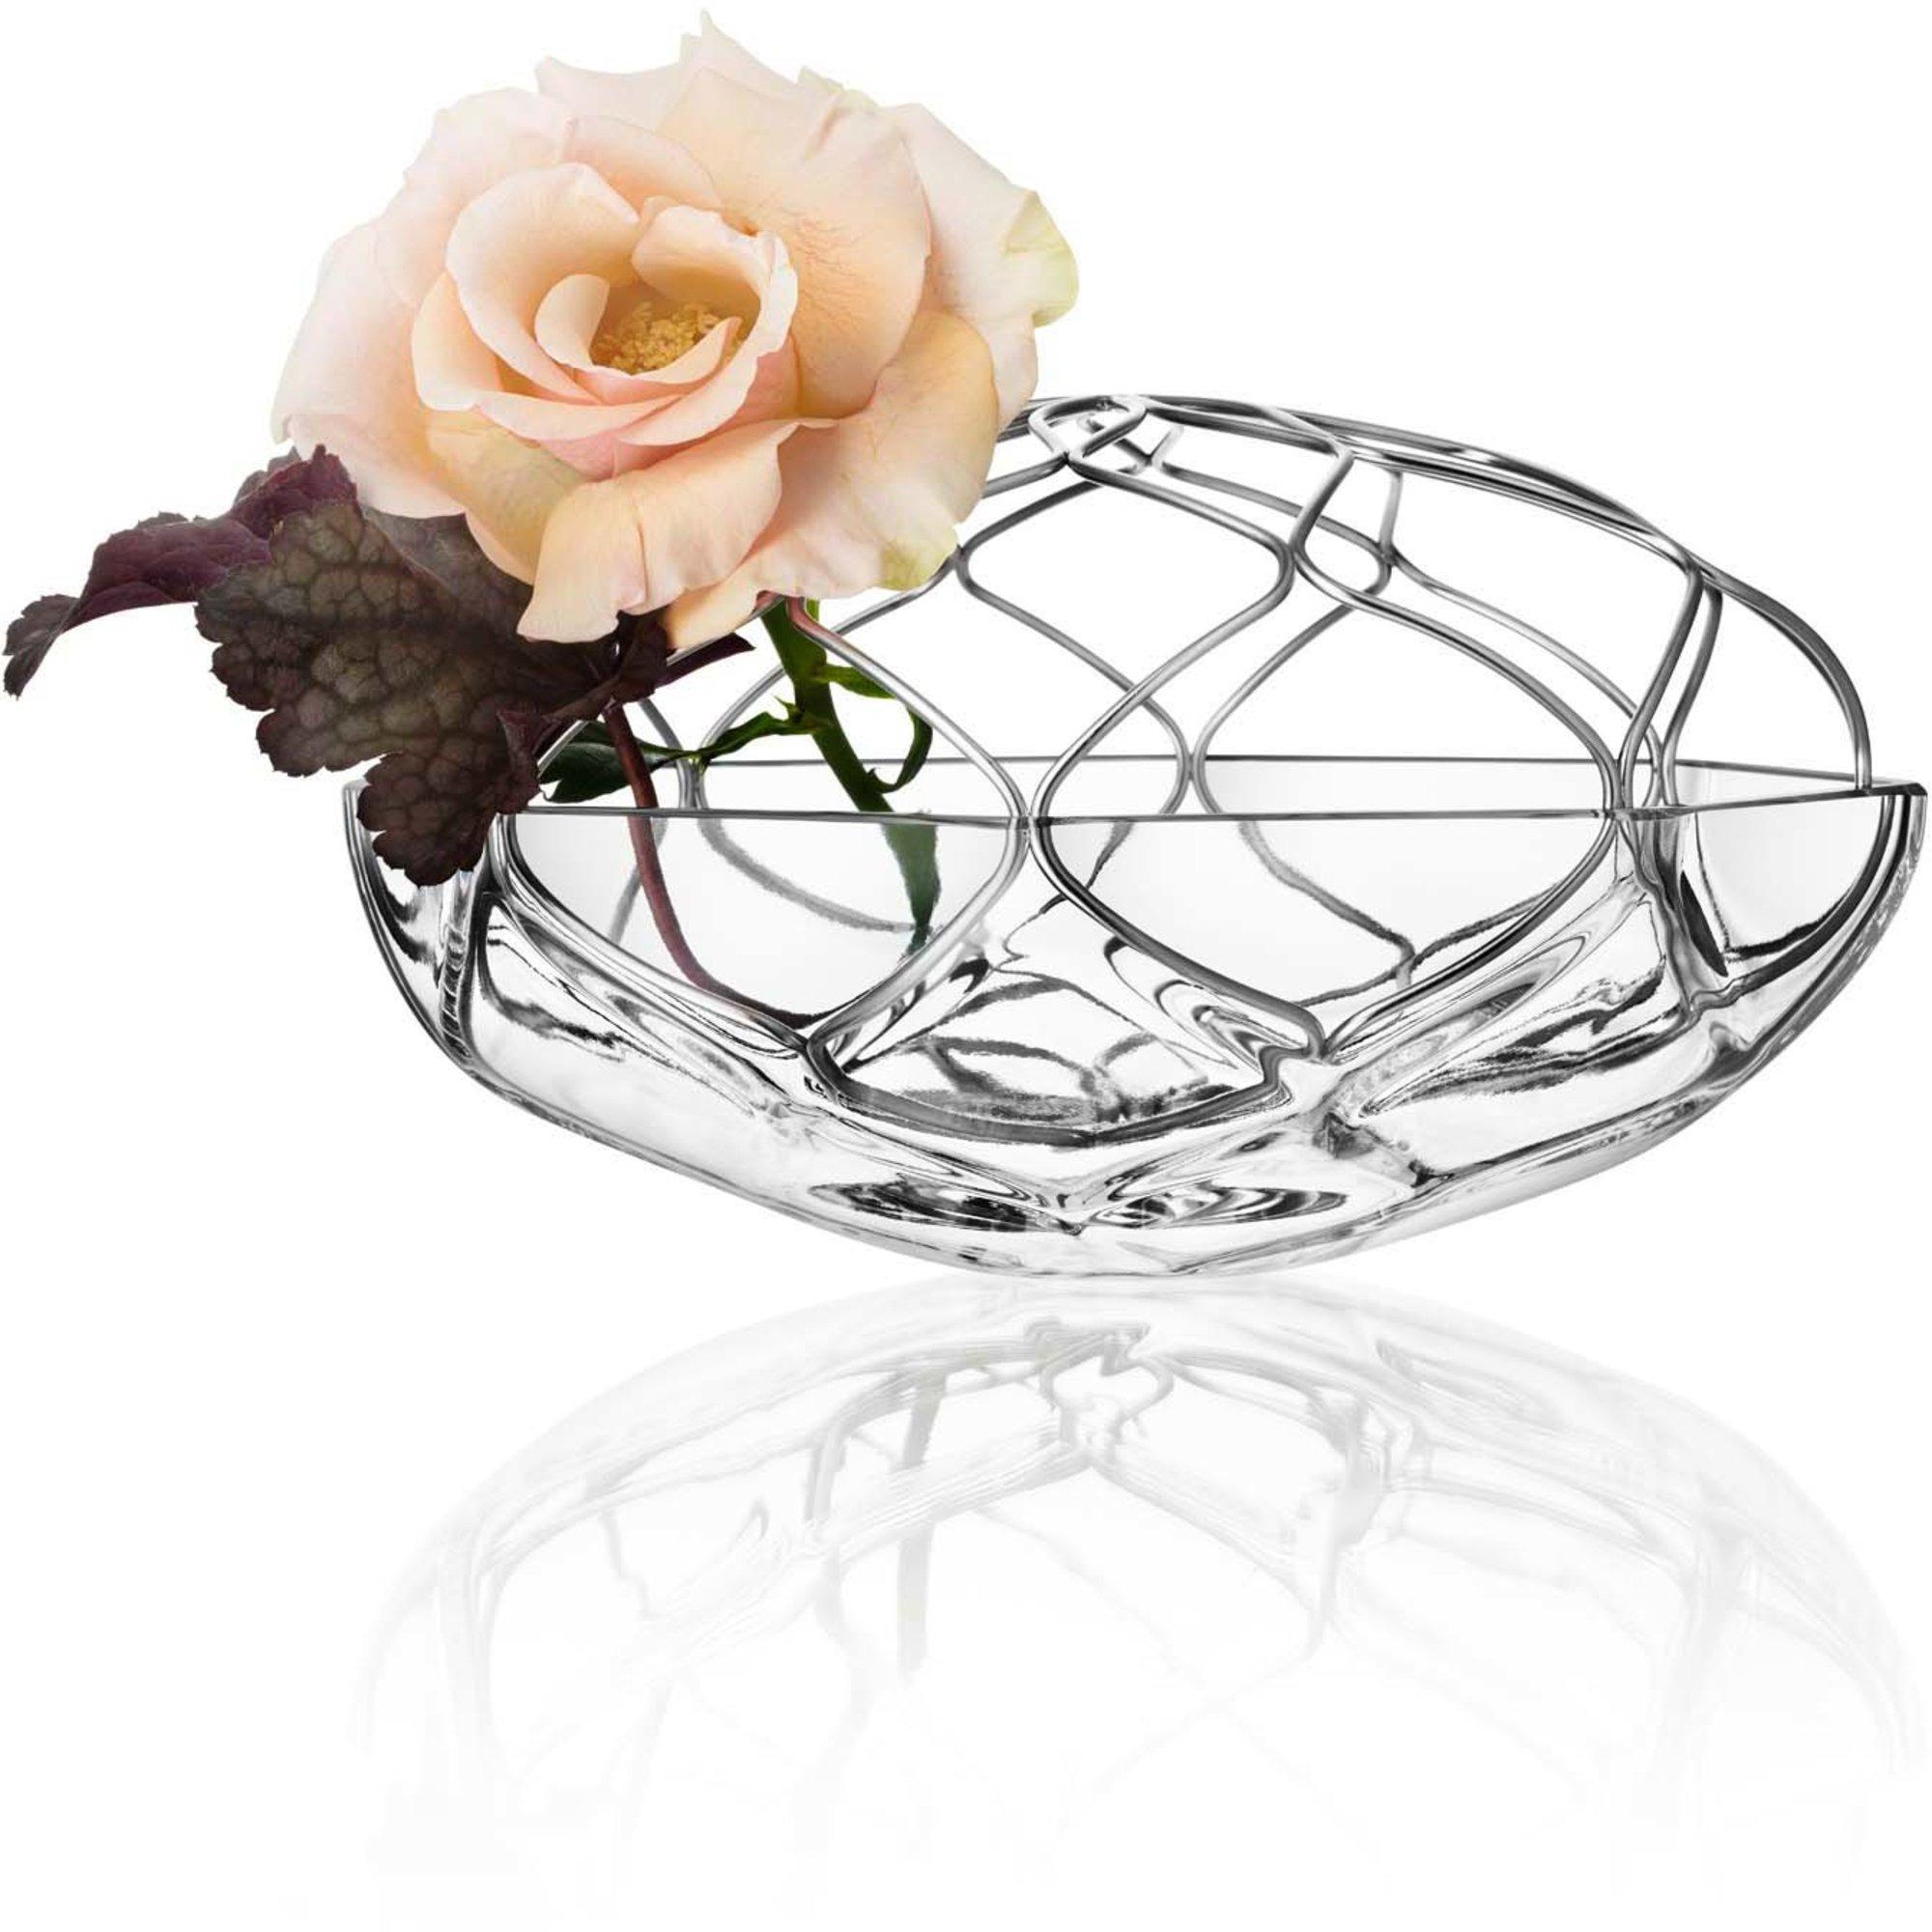 Orrefors Bloom Vas klar 21 cm